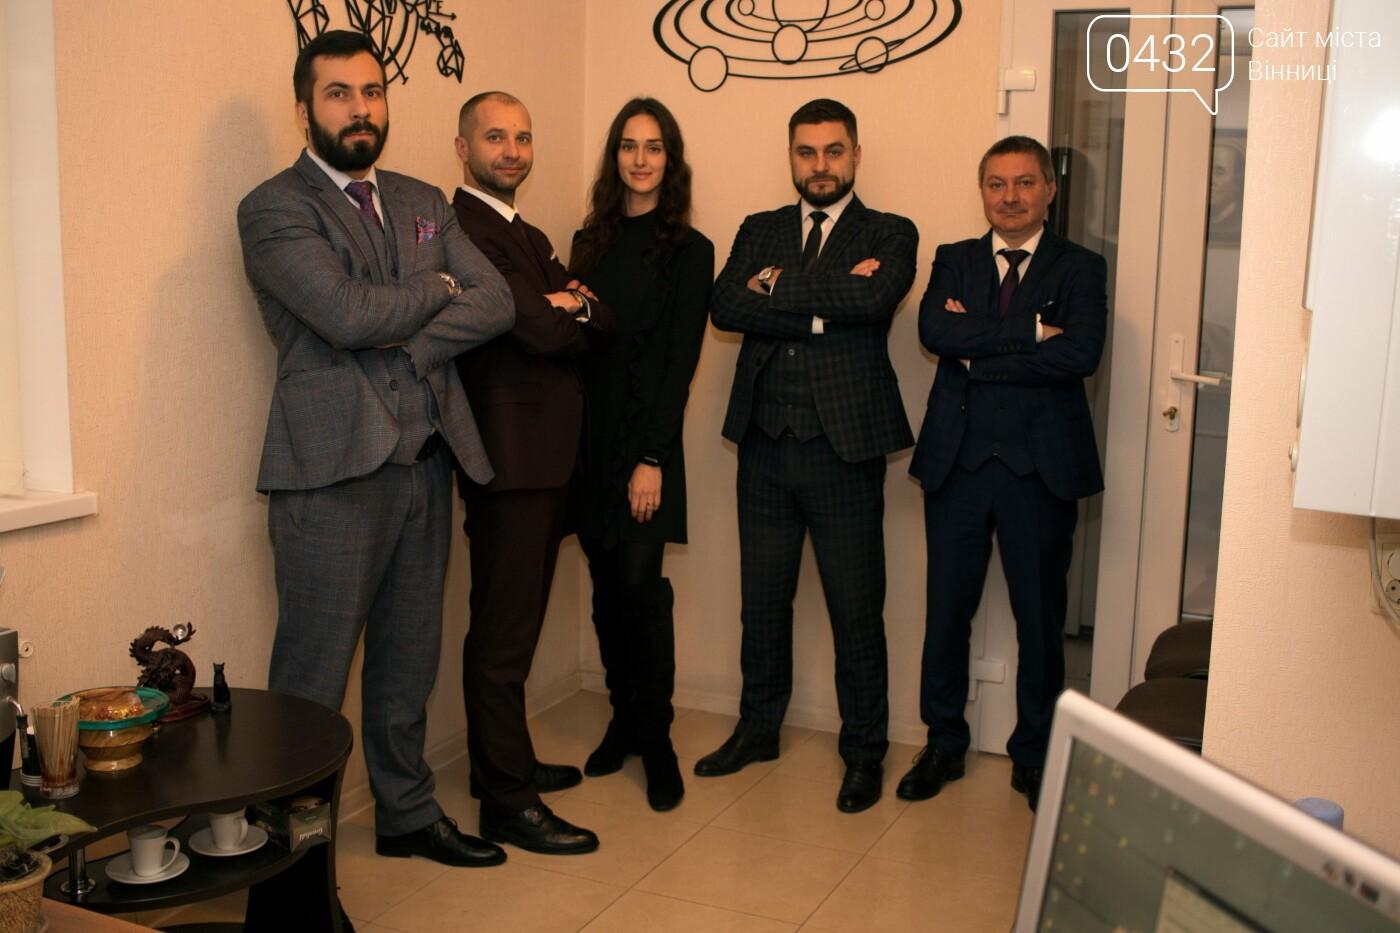 Как адвокаты избавили клиента от долгов: адвокат по кредитам Винница, фото-2